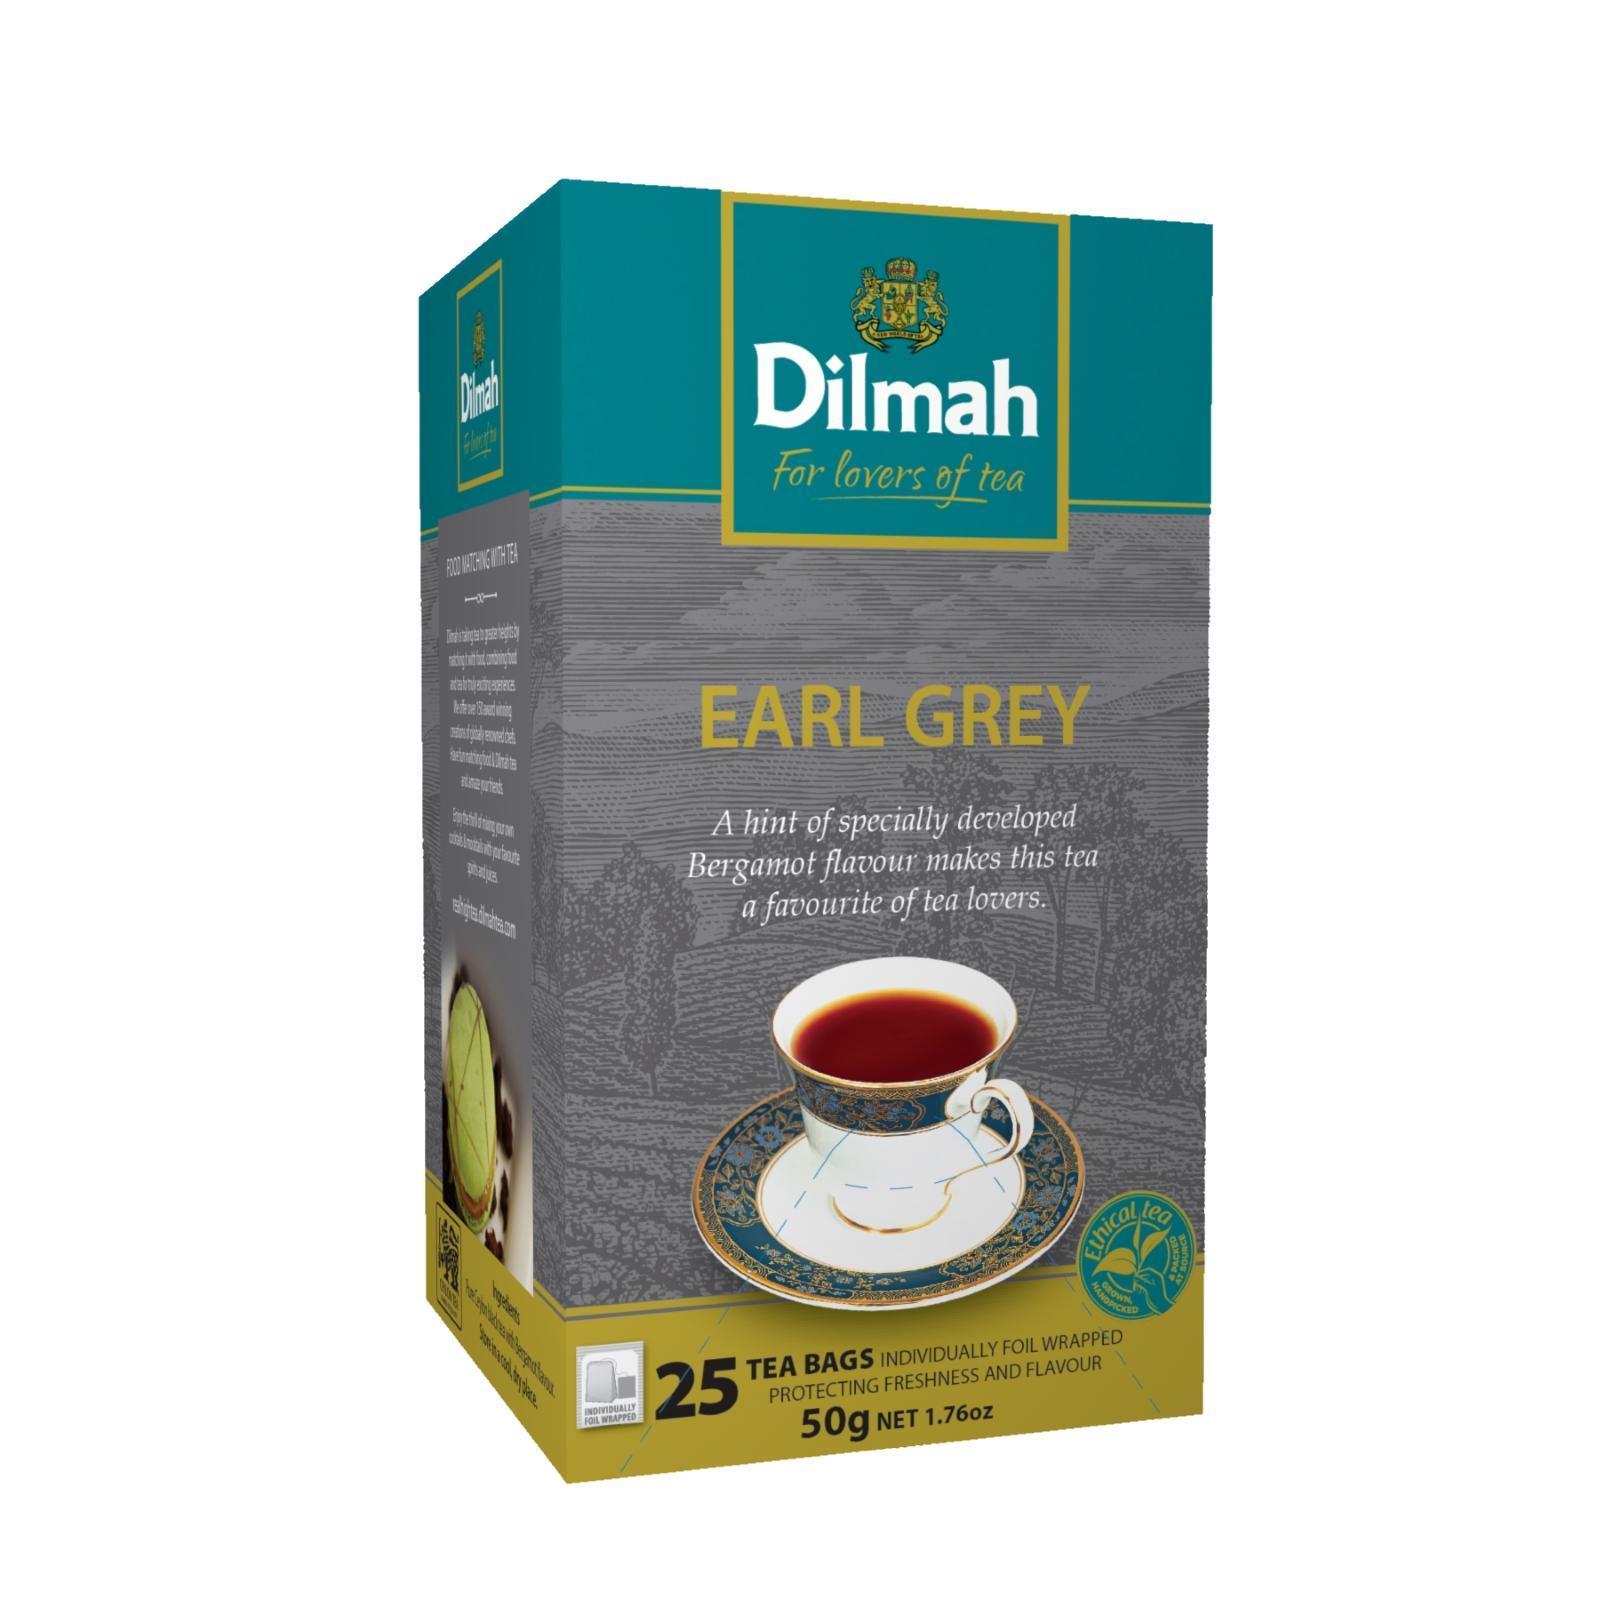 Dilmah Earl Grey Tea